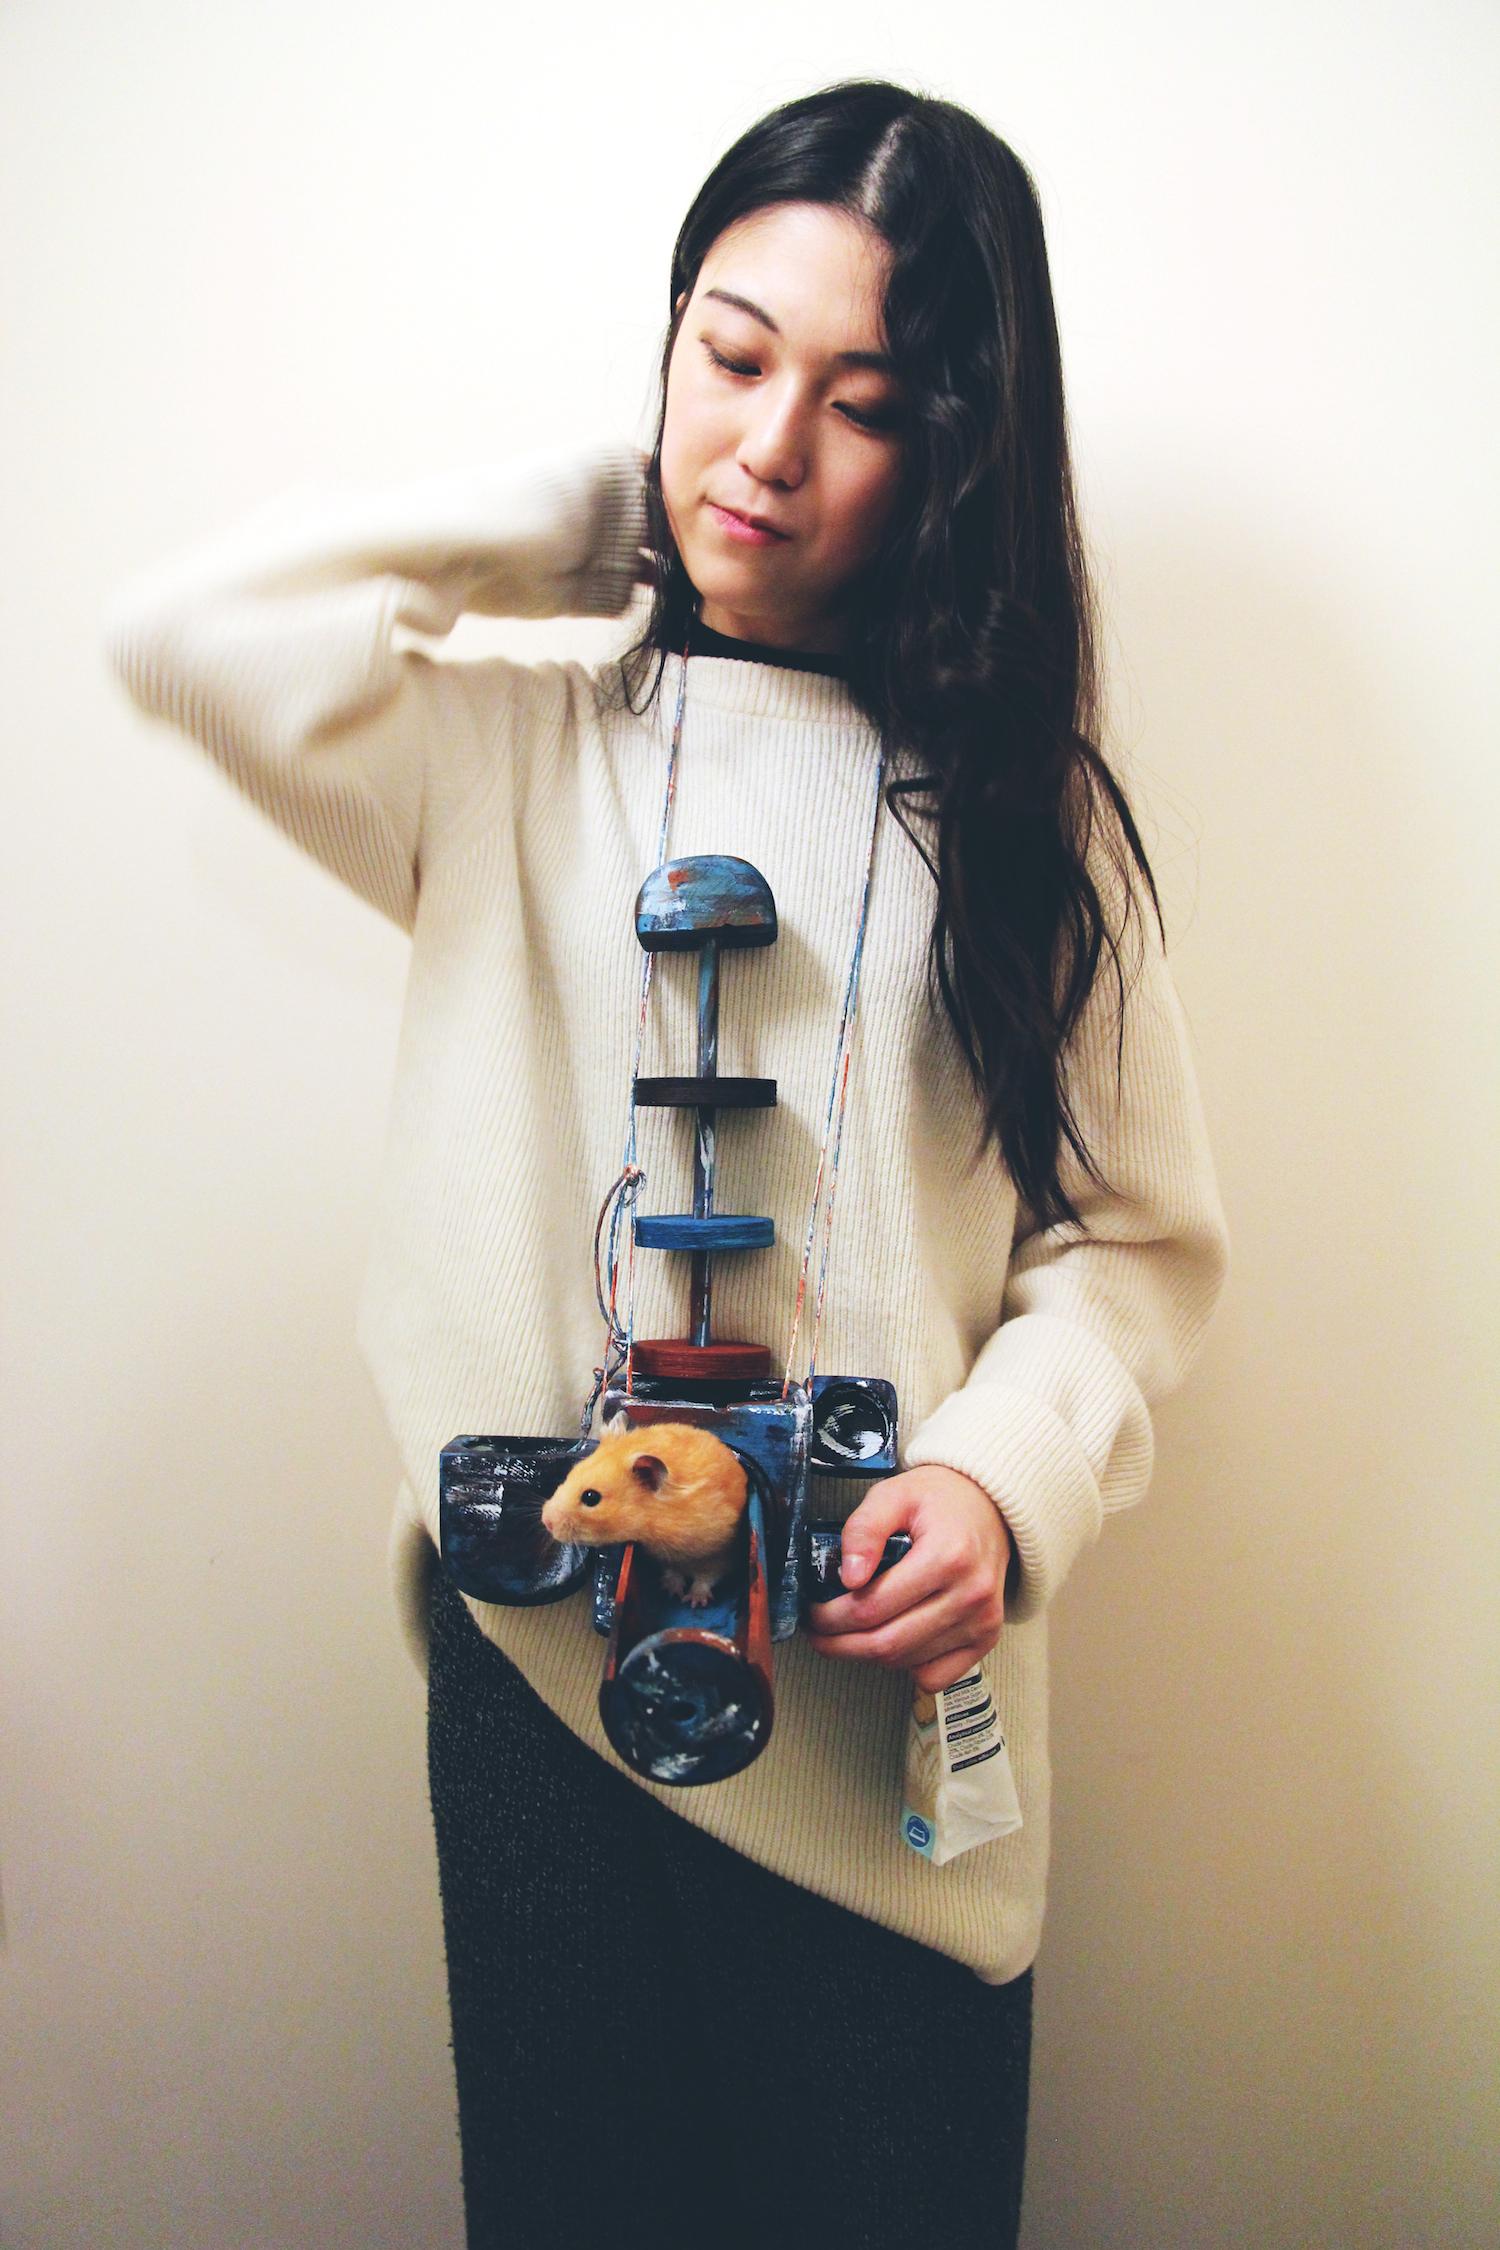 Inhabit – Chloe Jiang, CSM Winner